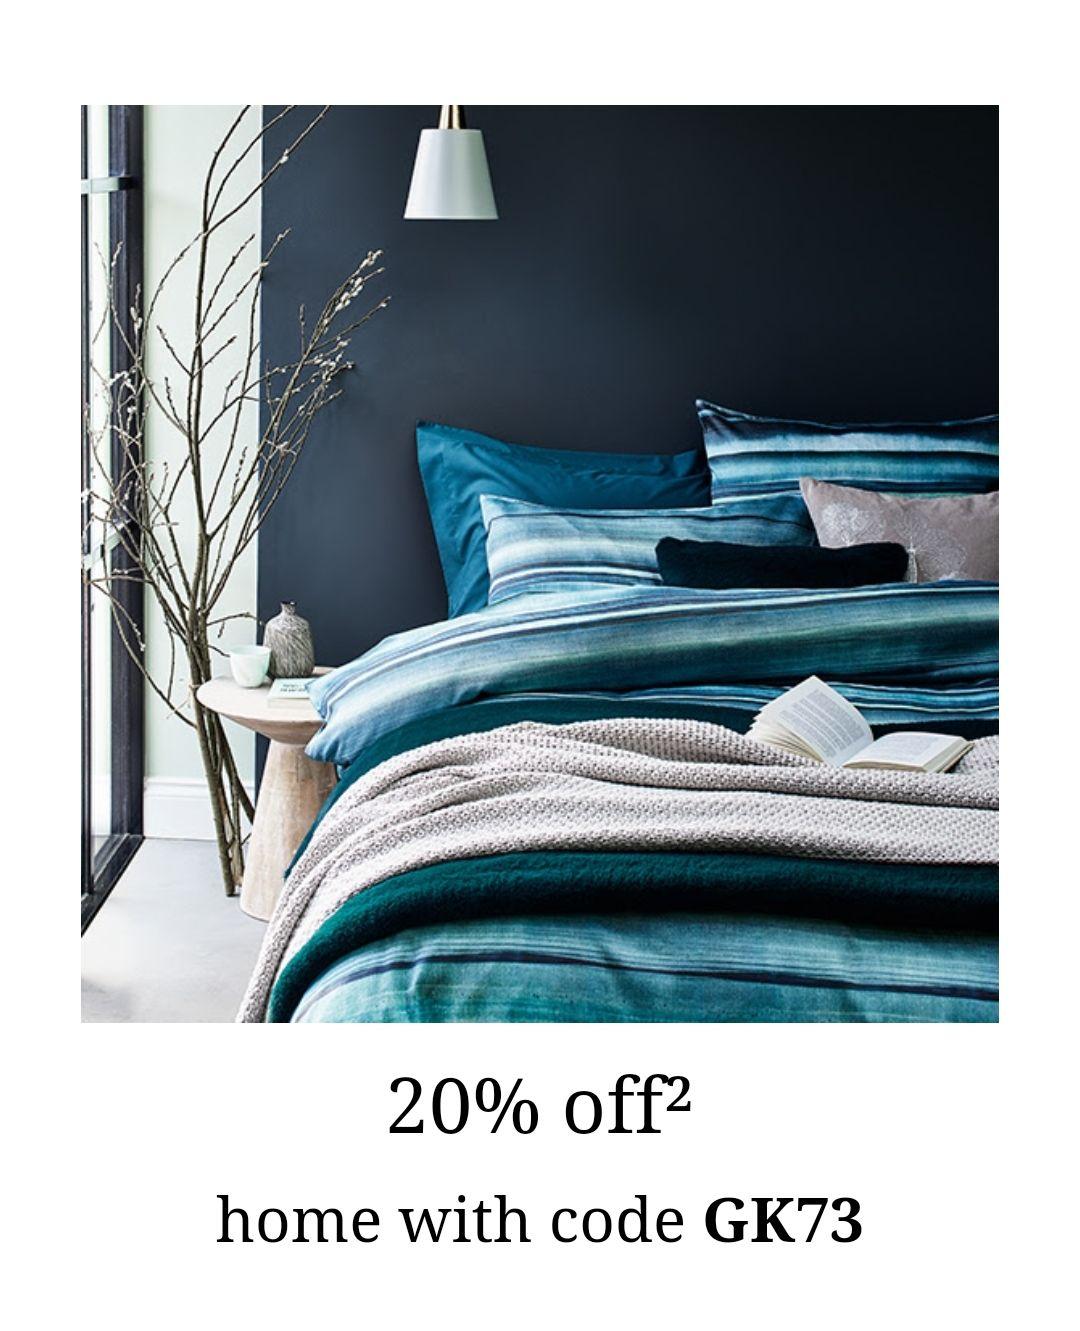 20% off home w/code at Debenhams